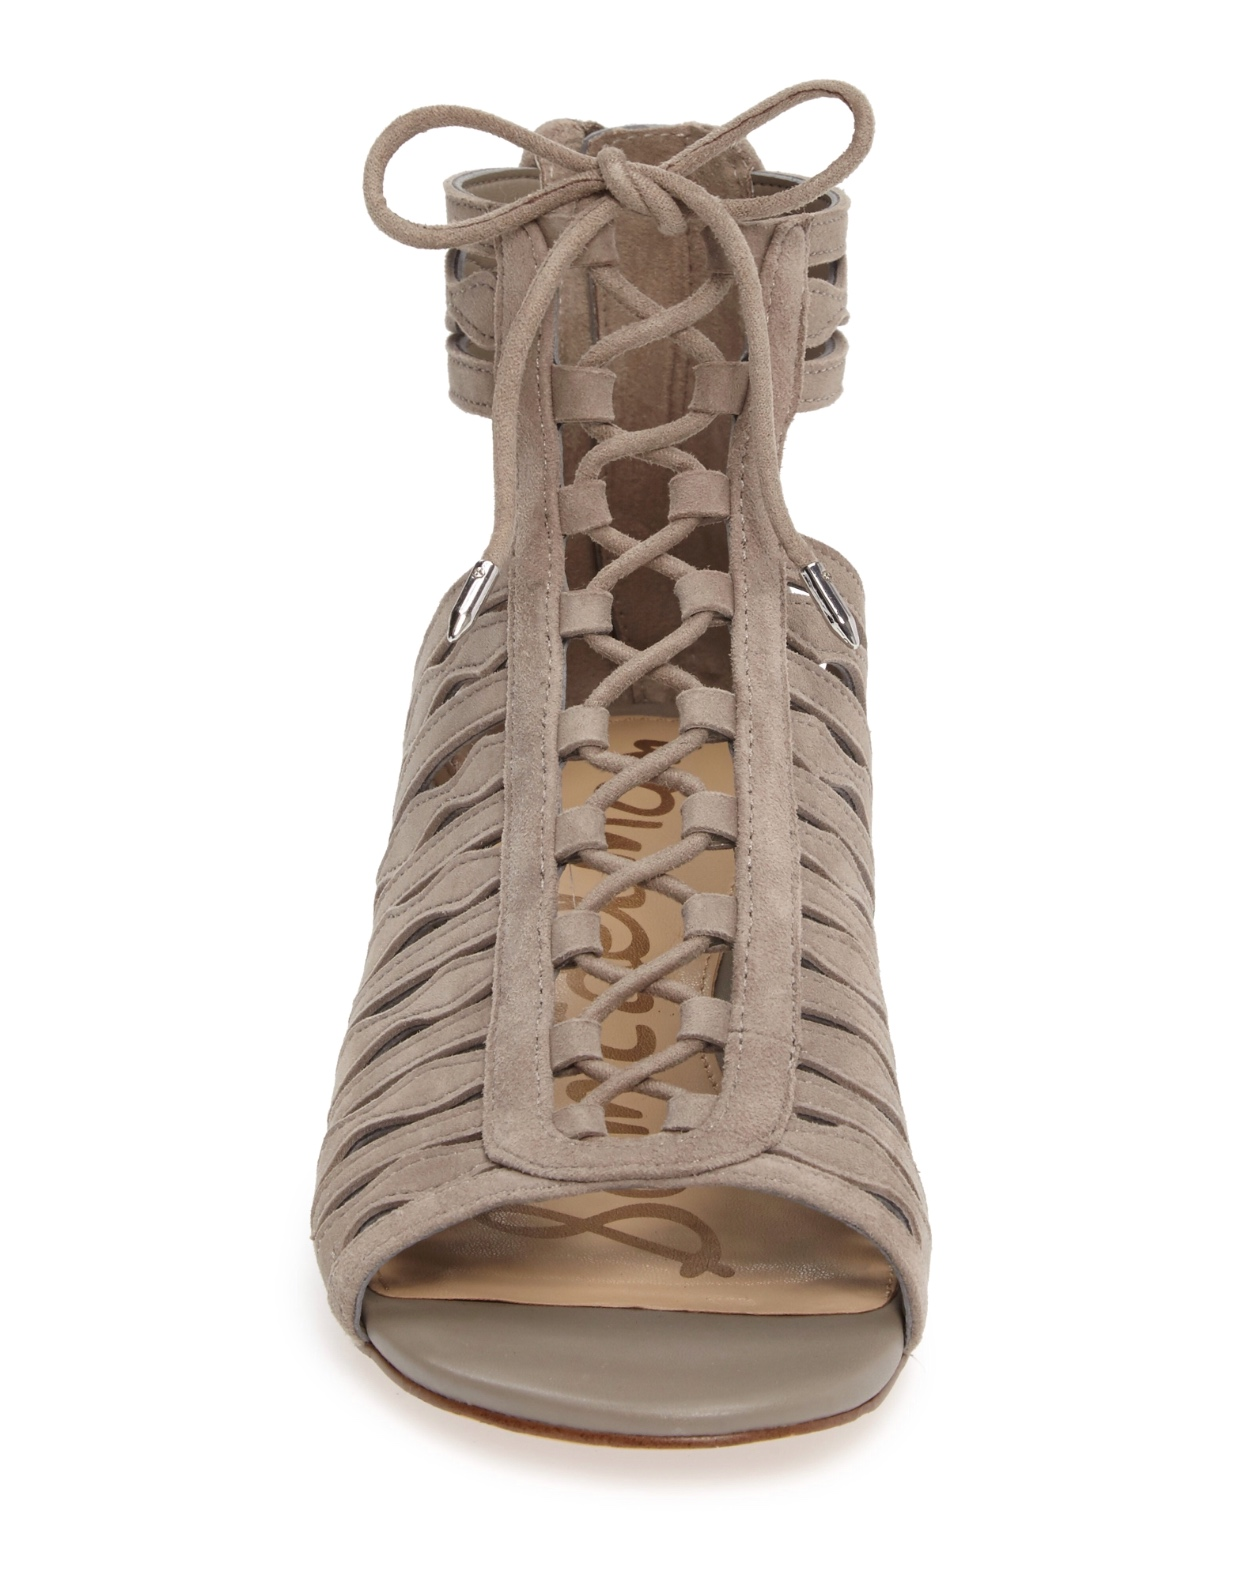 Daleece Lace-Up Sandal SAM EDELMAN